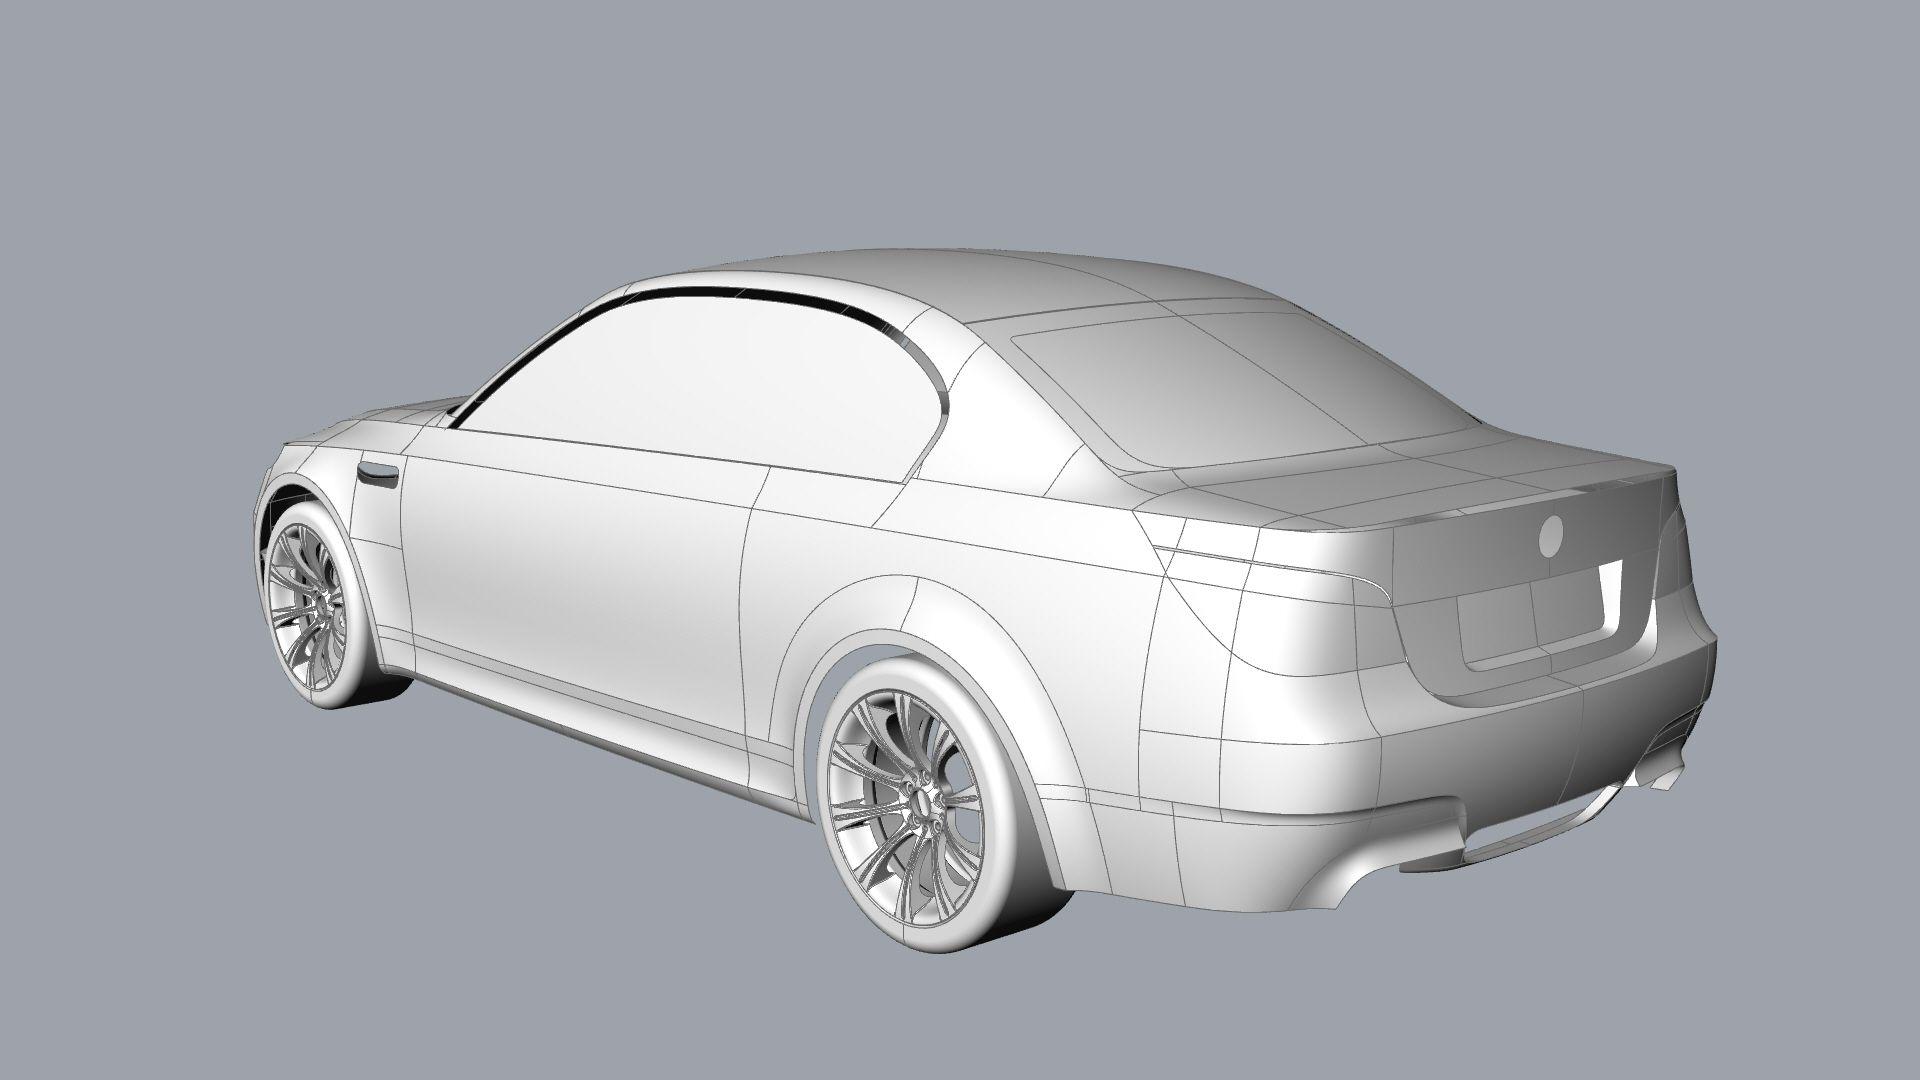 Bmw e60 m5 nurbs smcars car blueprints forum my cars net car blueprints forum malvernweather Gallery